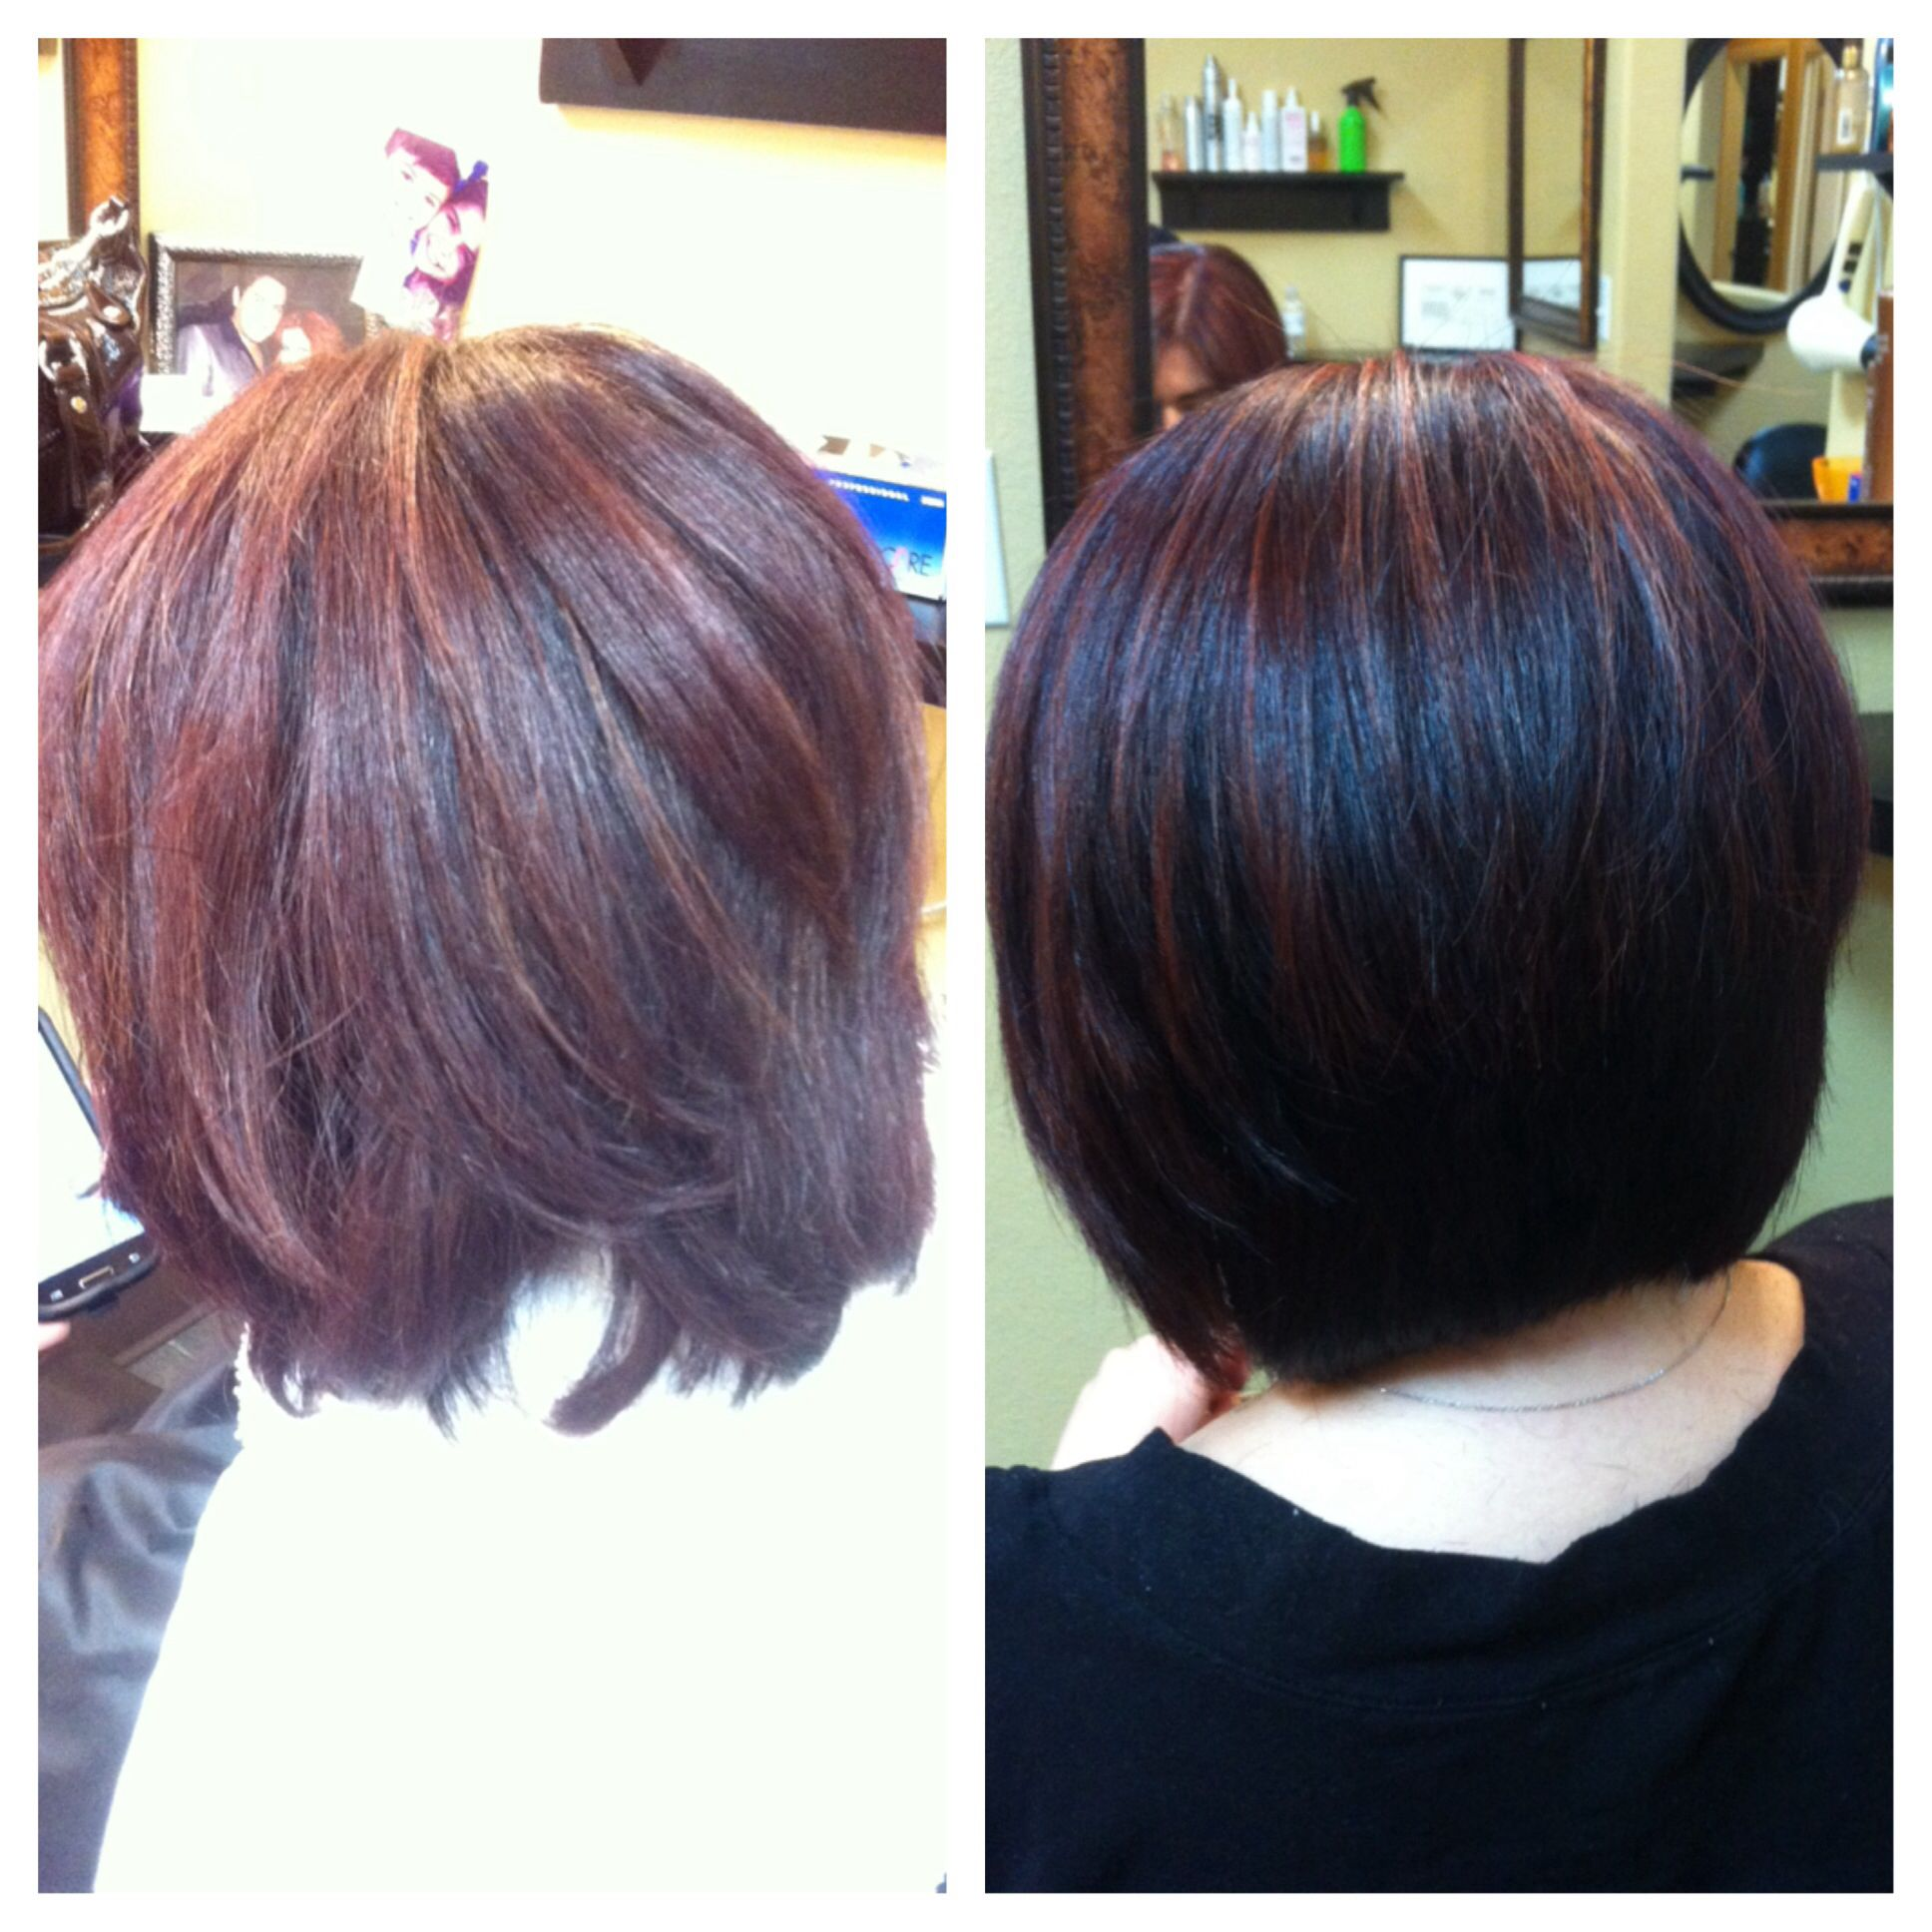 Pin on Hair by Karina Arevalo